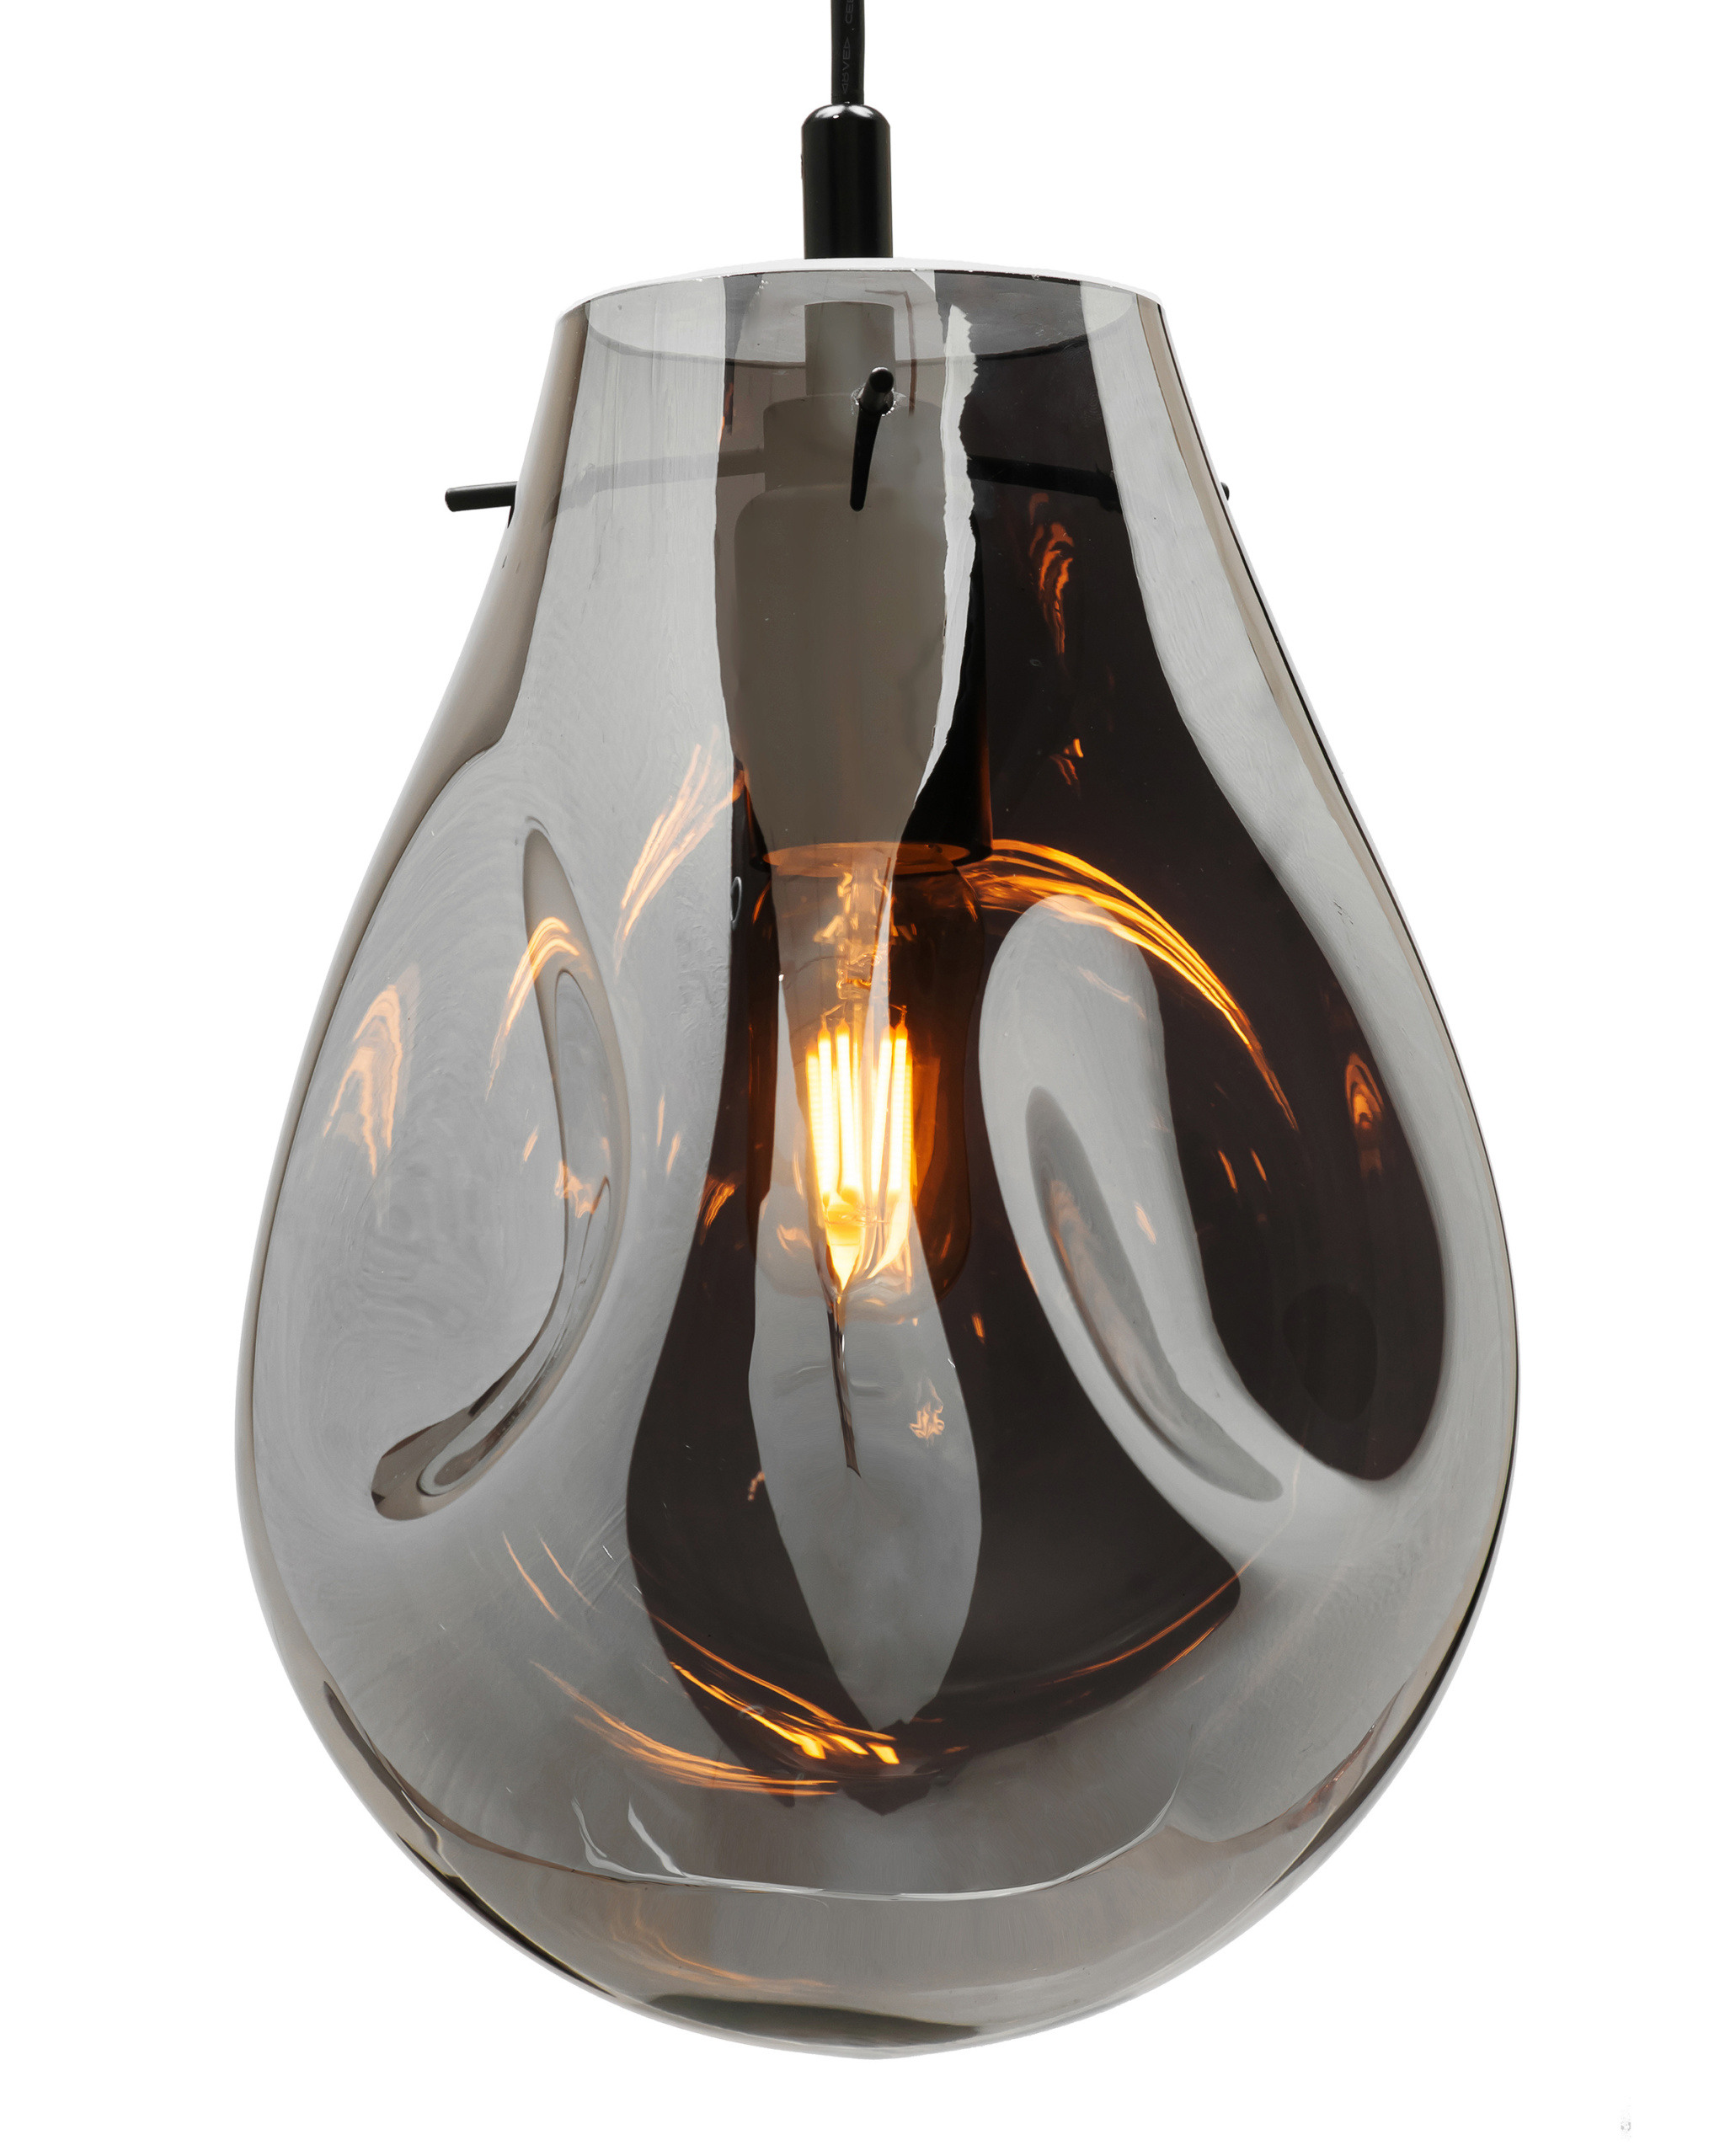 Mirror items - chandeliers in the photographer's portfolio